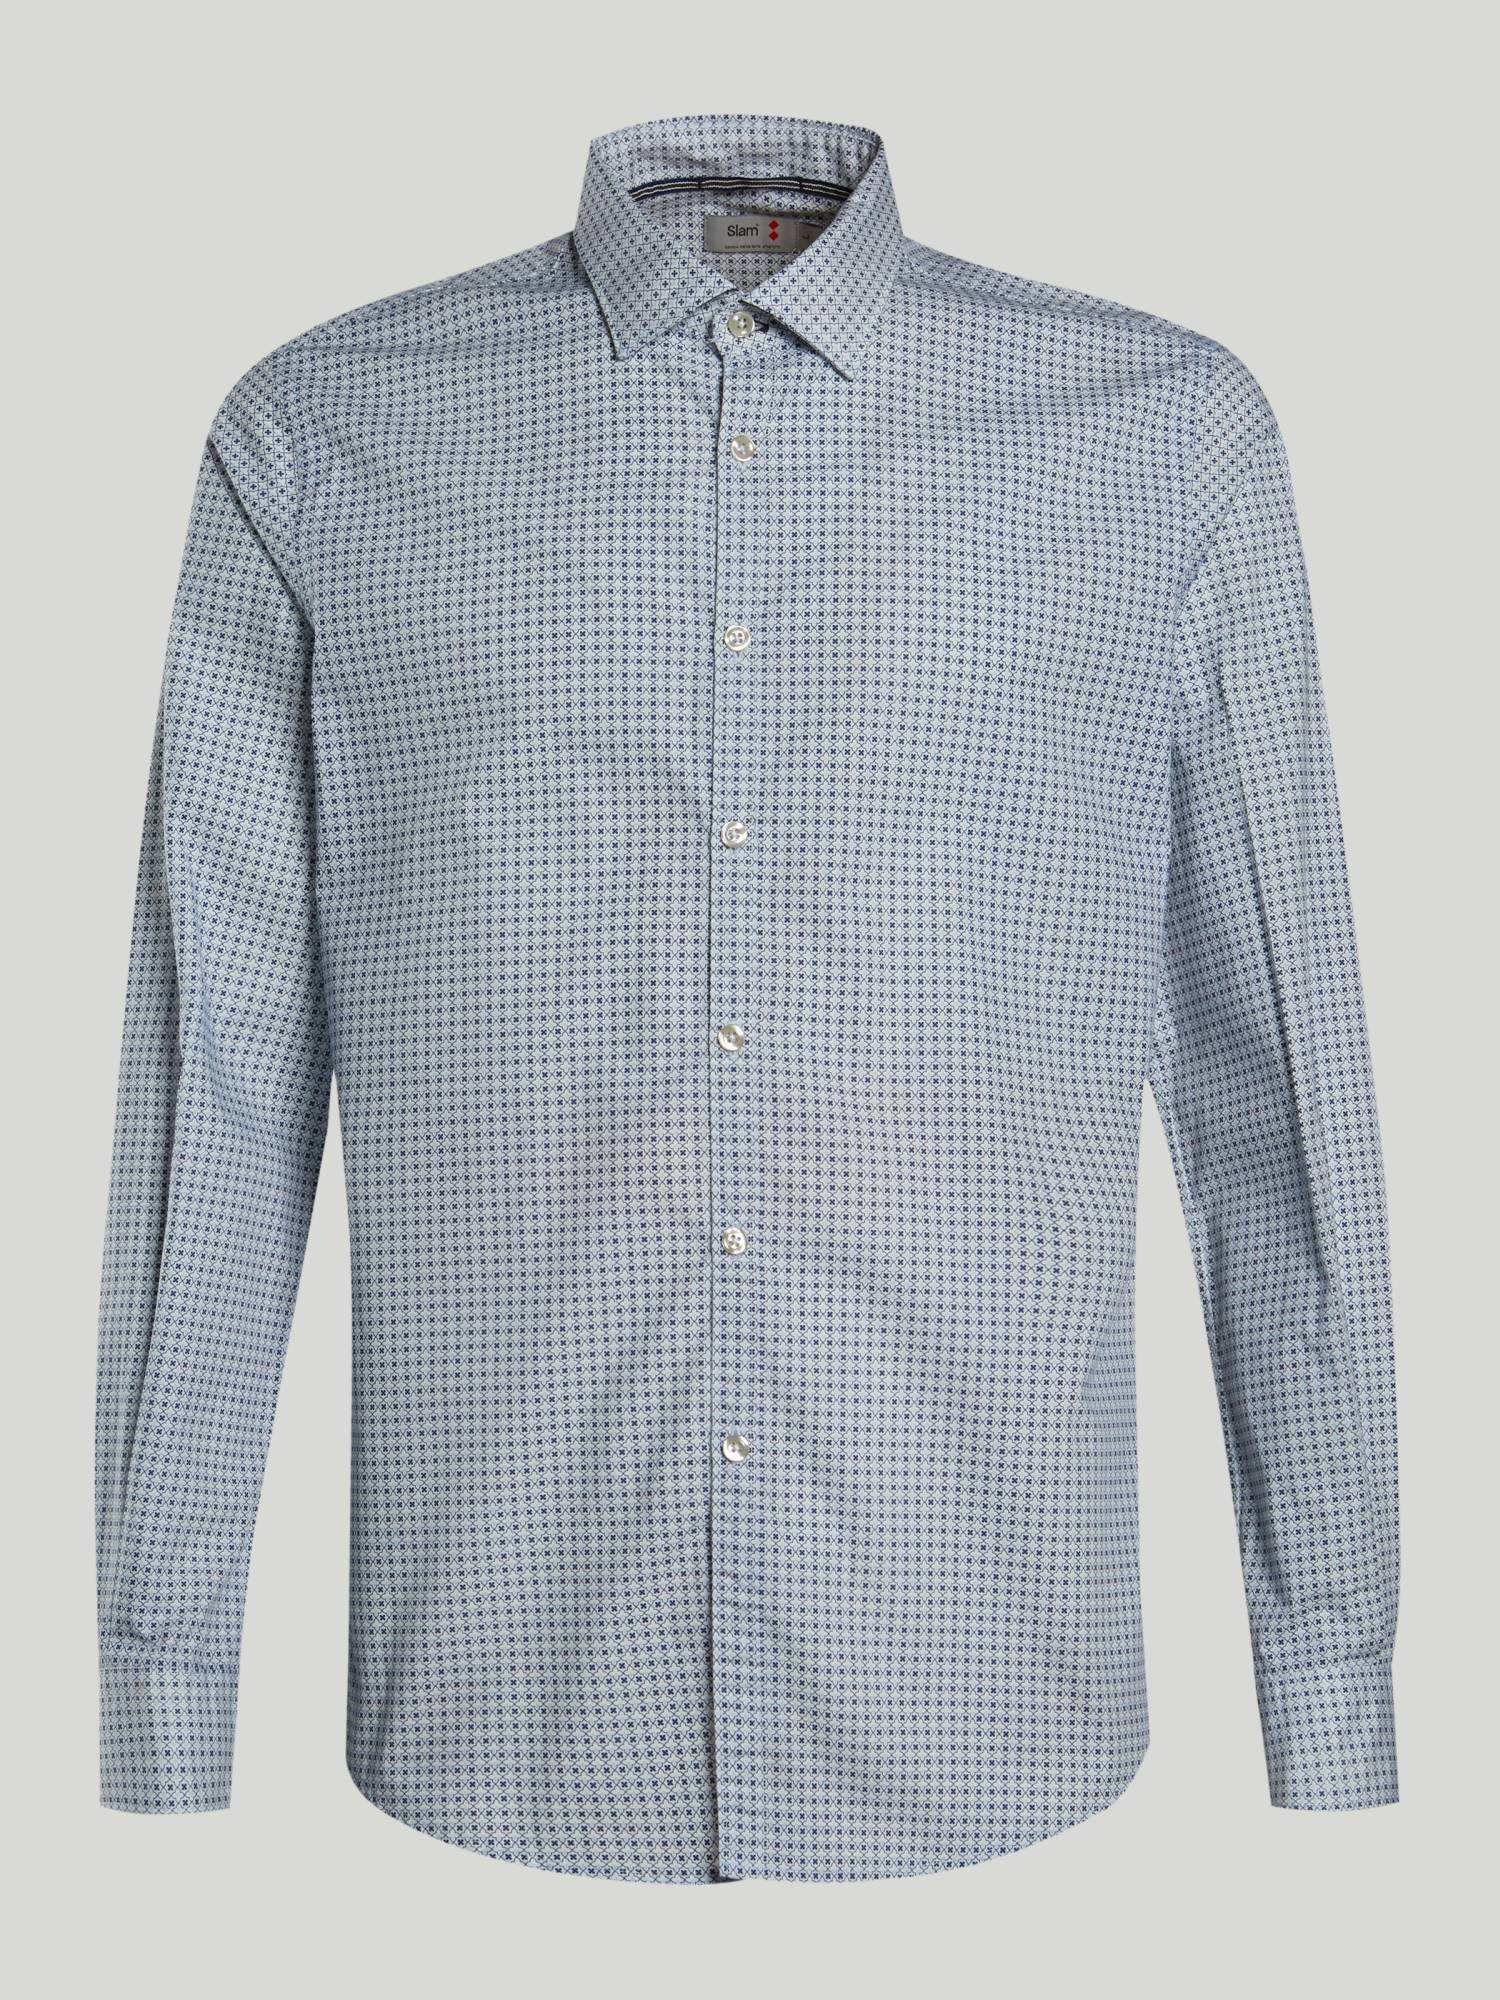 Shirt A149 - White / Navy